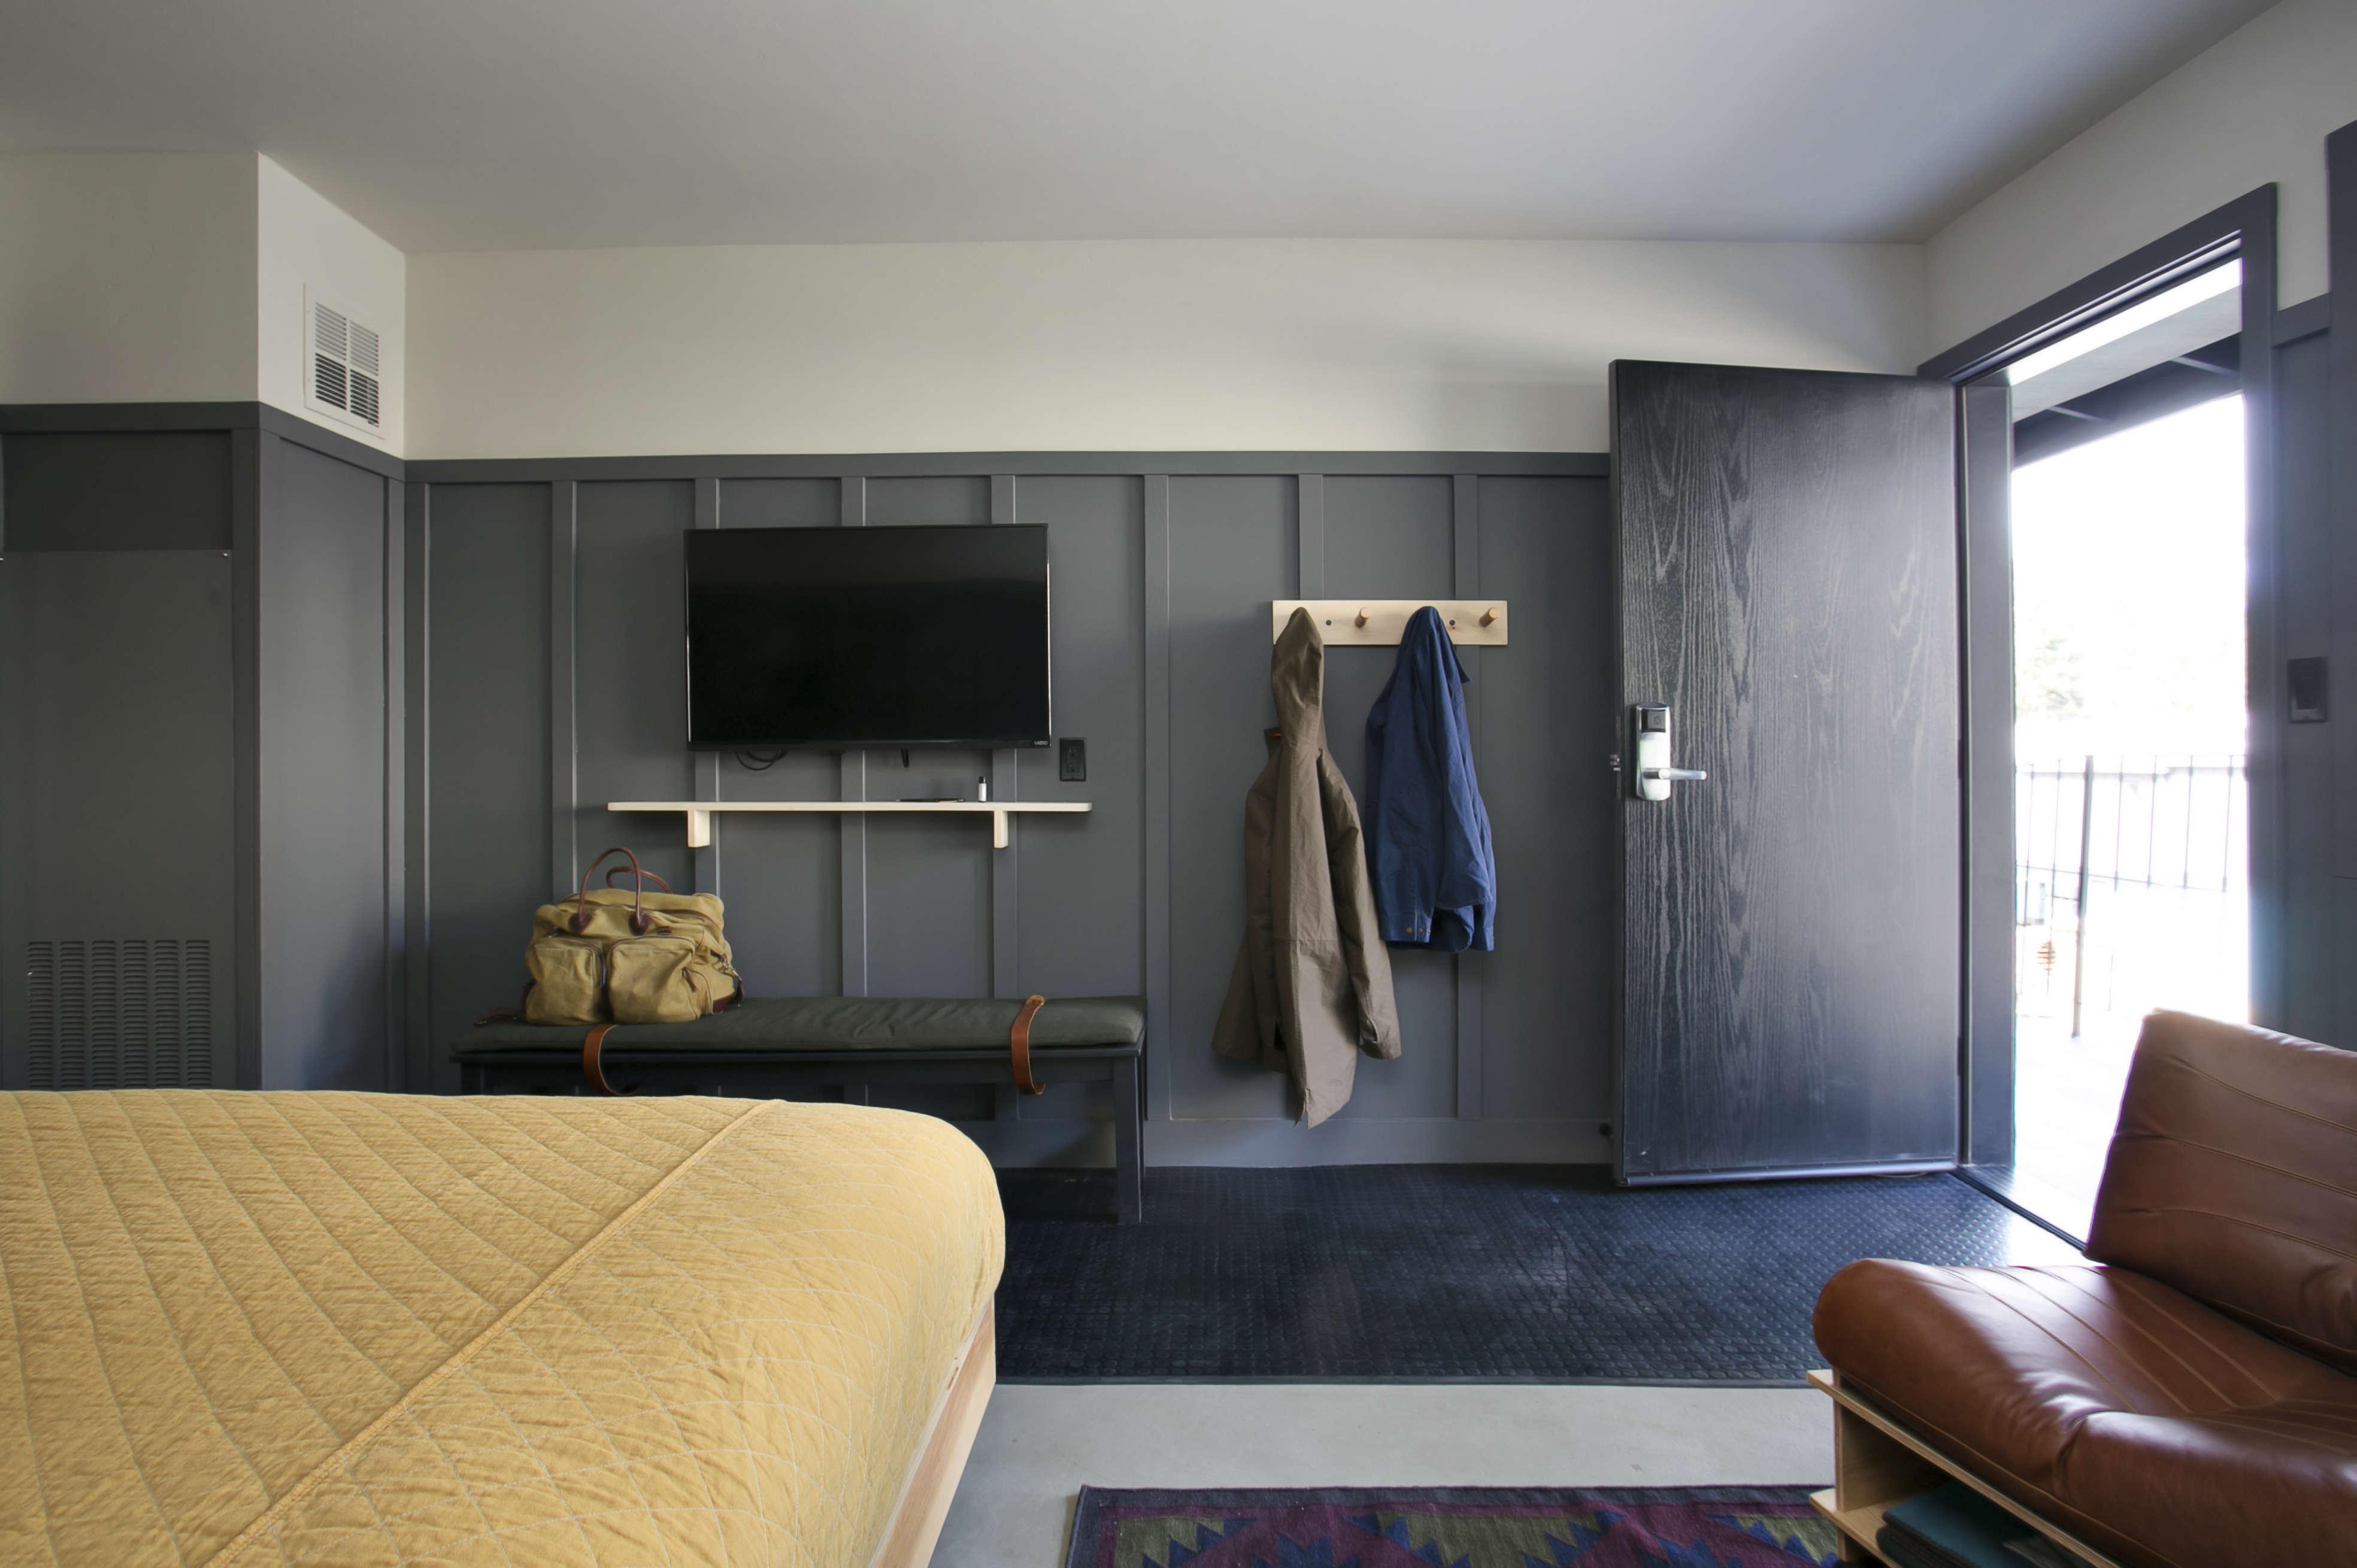 coachman-hotel-guest-room-gray-walls